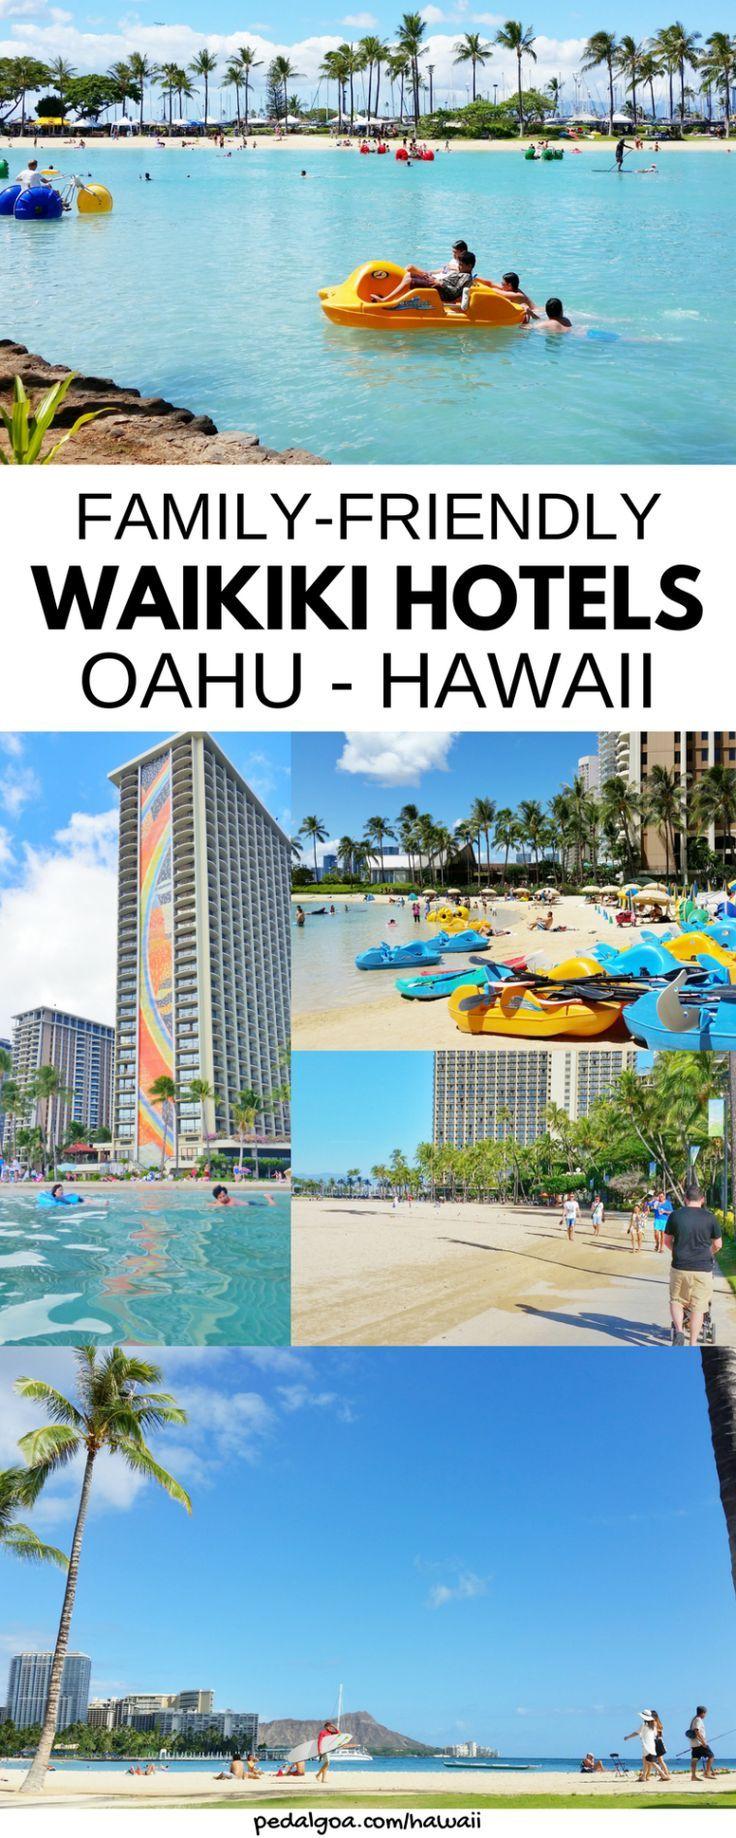 Best Waikiki Hotels For Families :: Kid-friendly